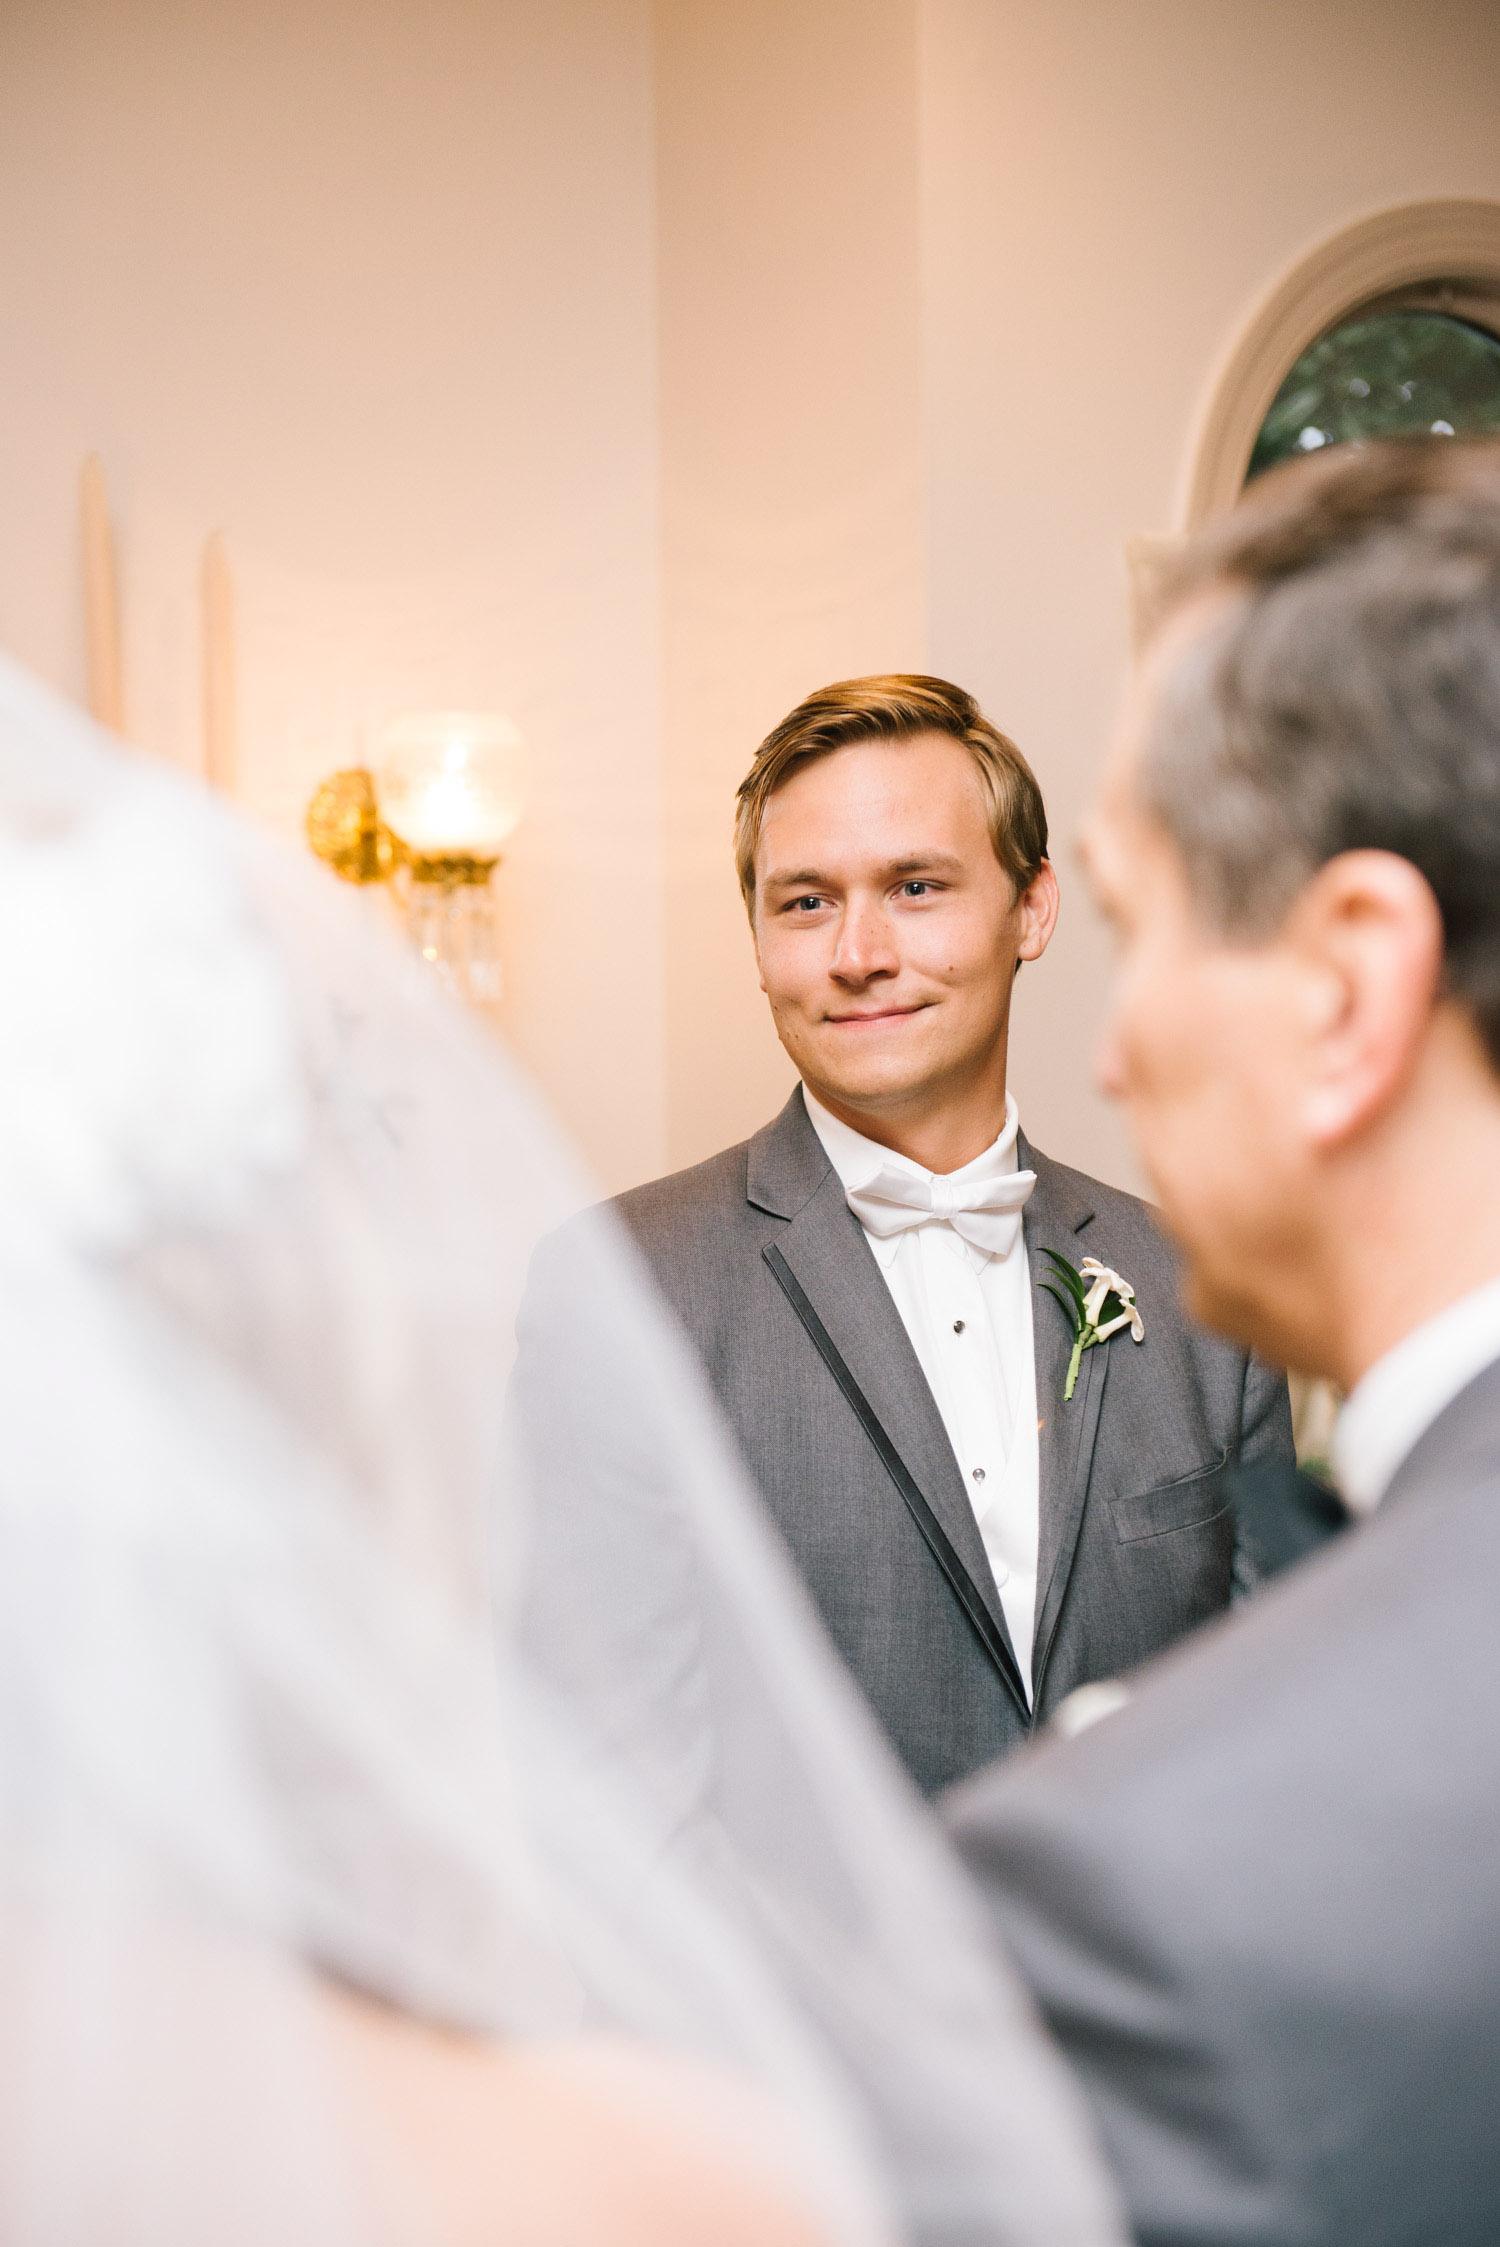 youngstrom-wedding-111.jpg